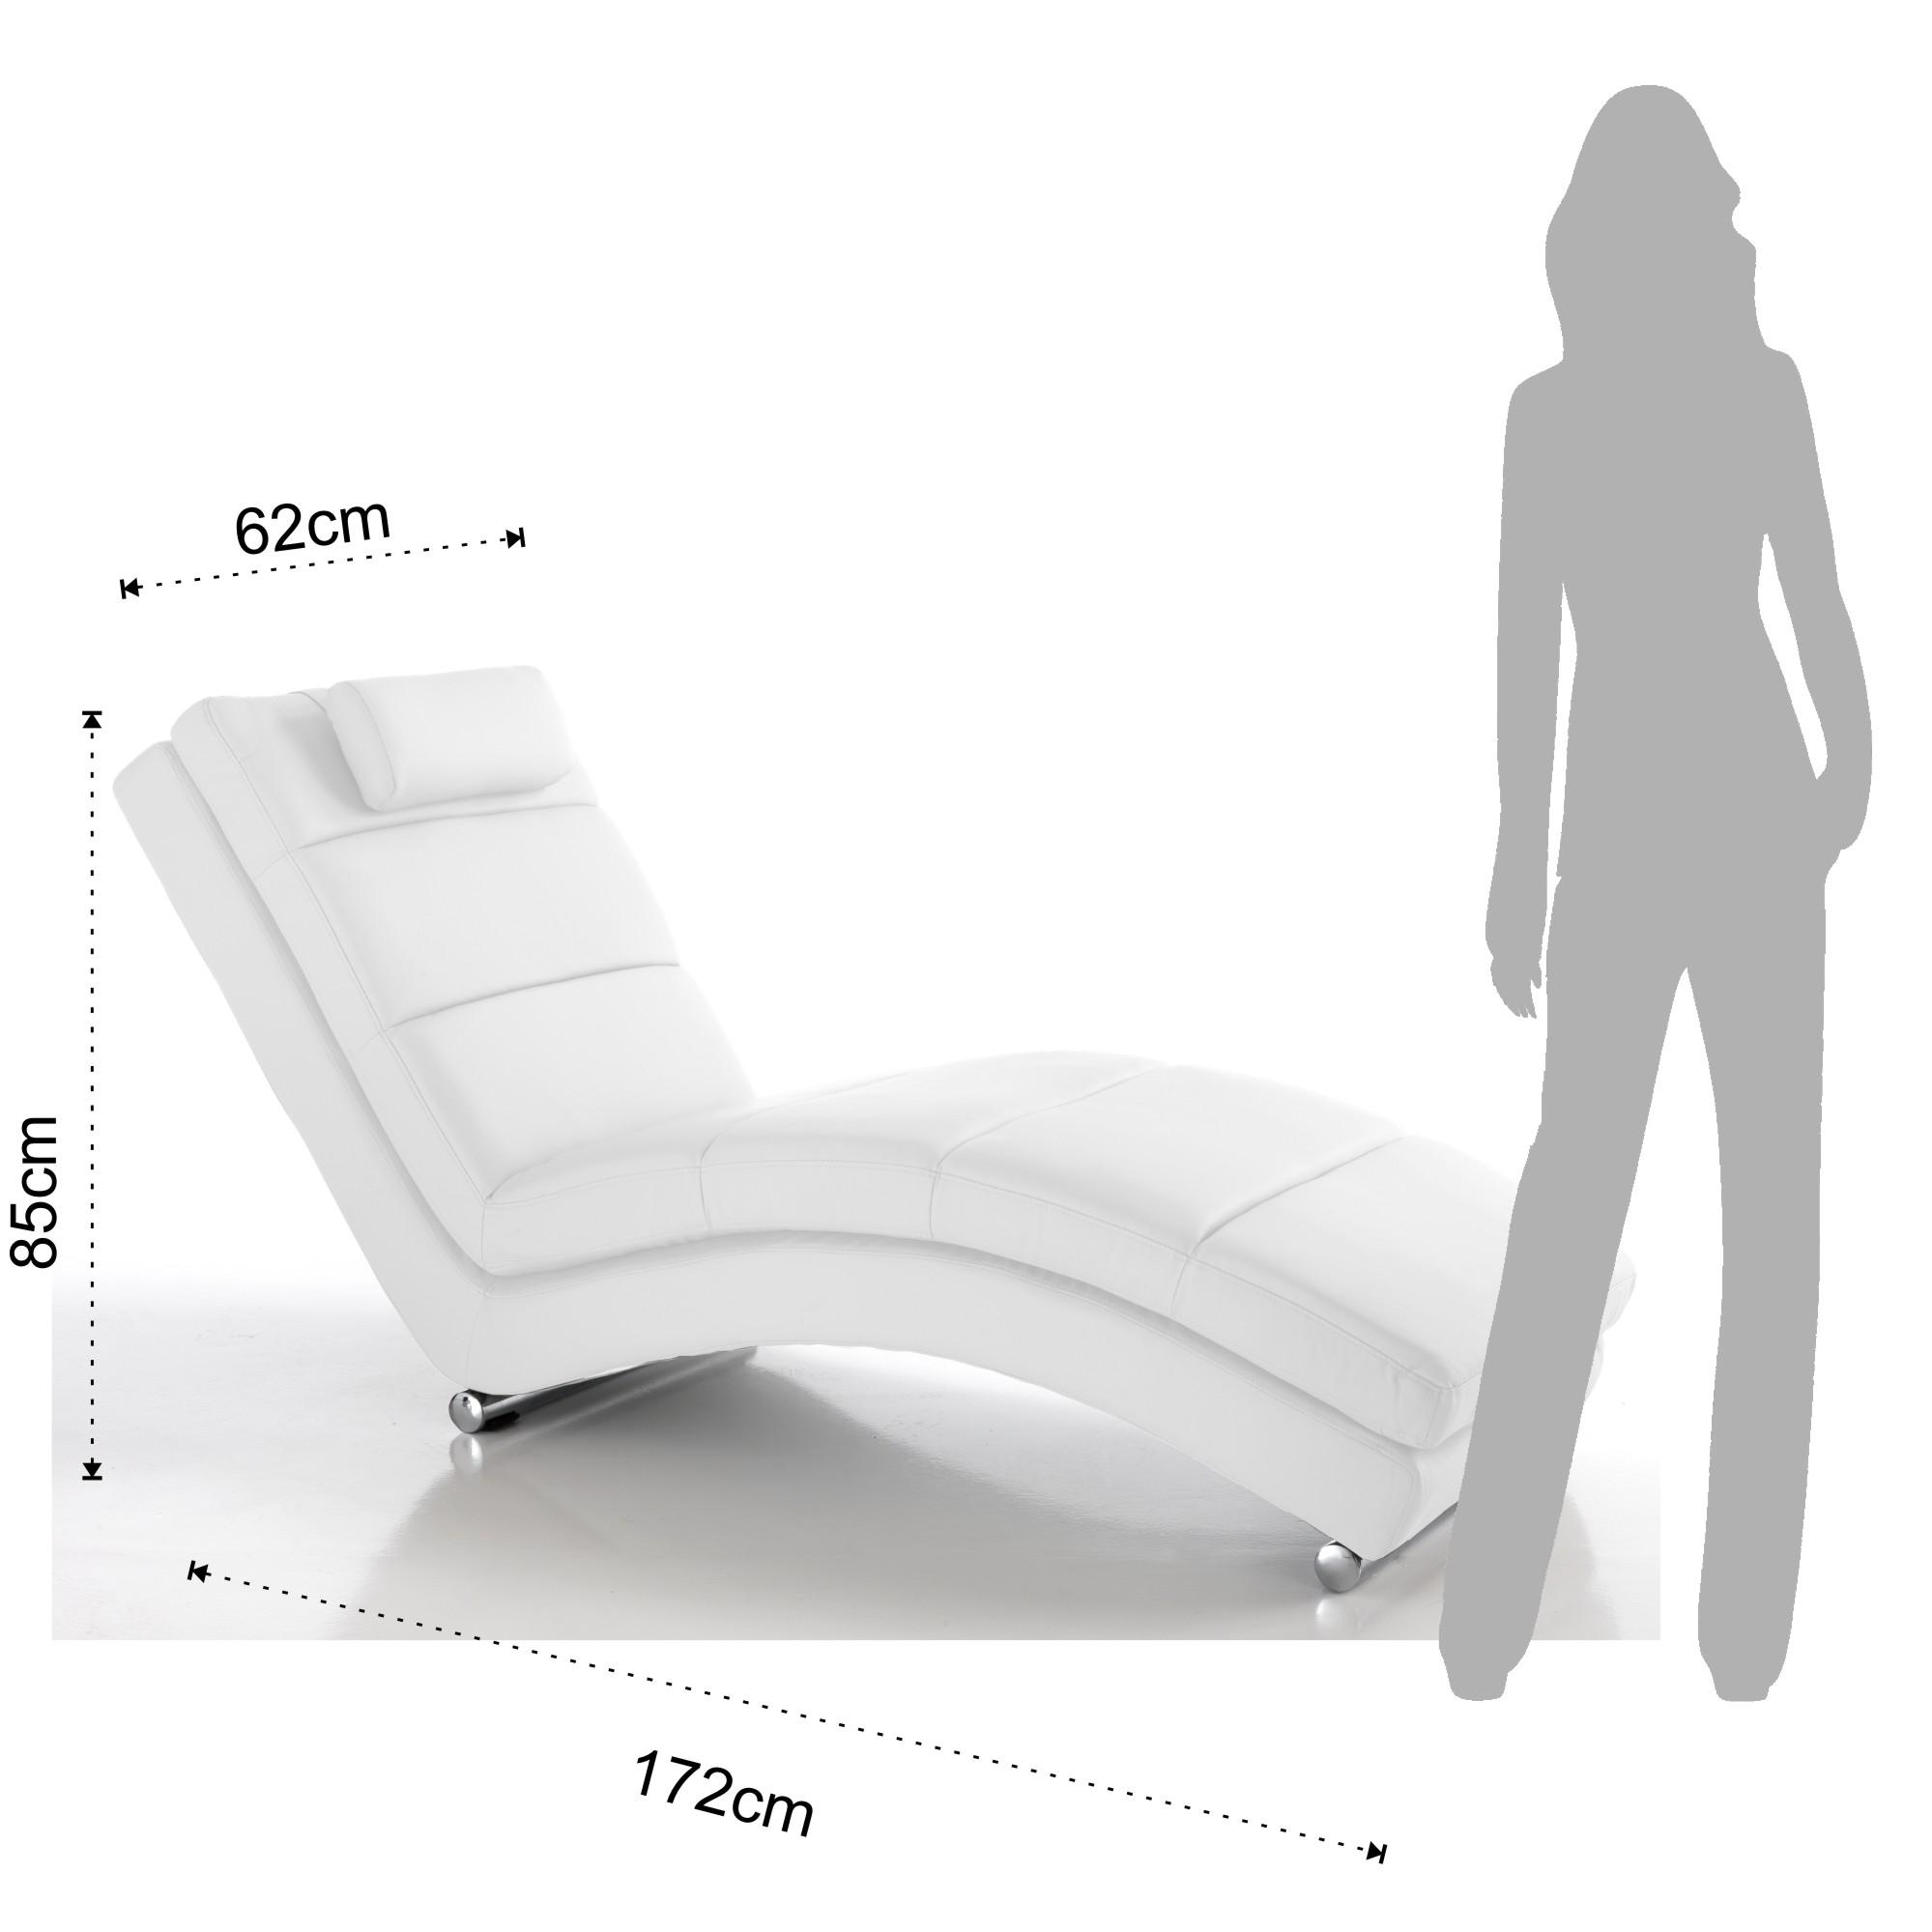 divani chaise longue sofia white. Black Bedroom Furniture Sets. Home Design Ideas